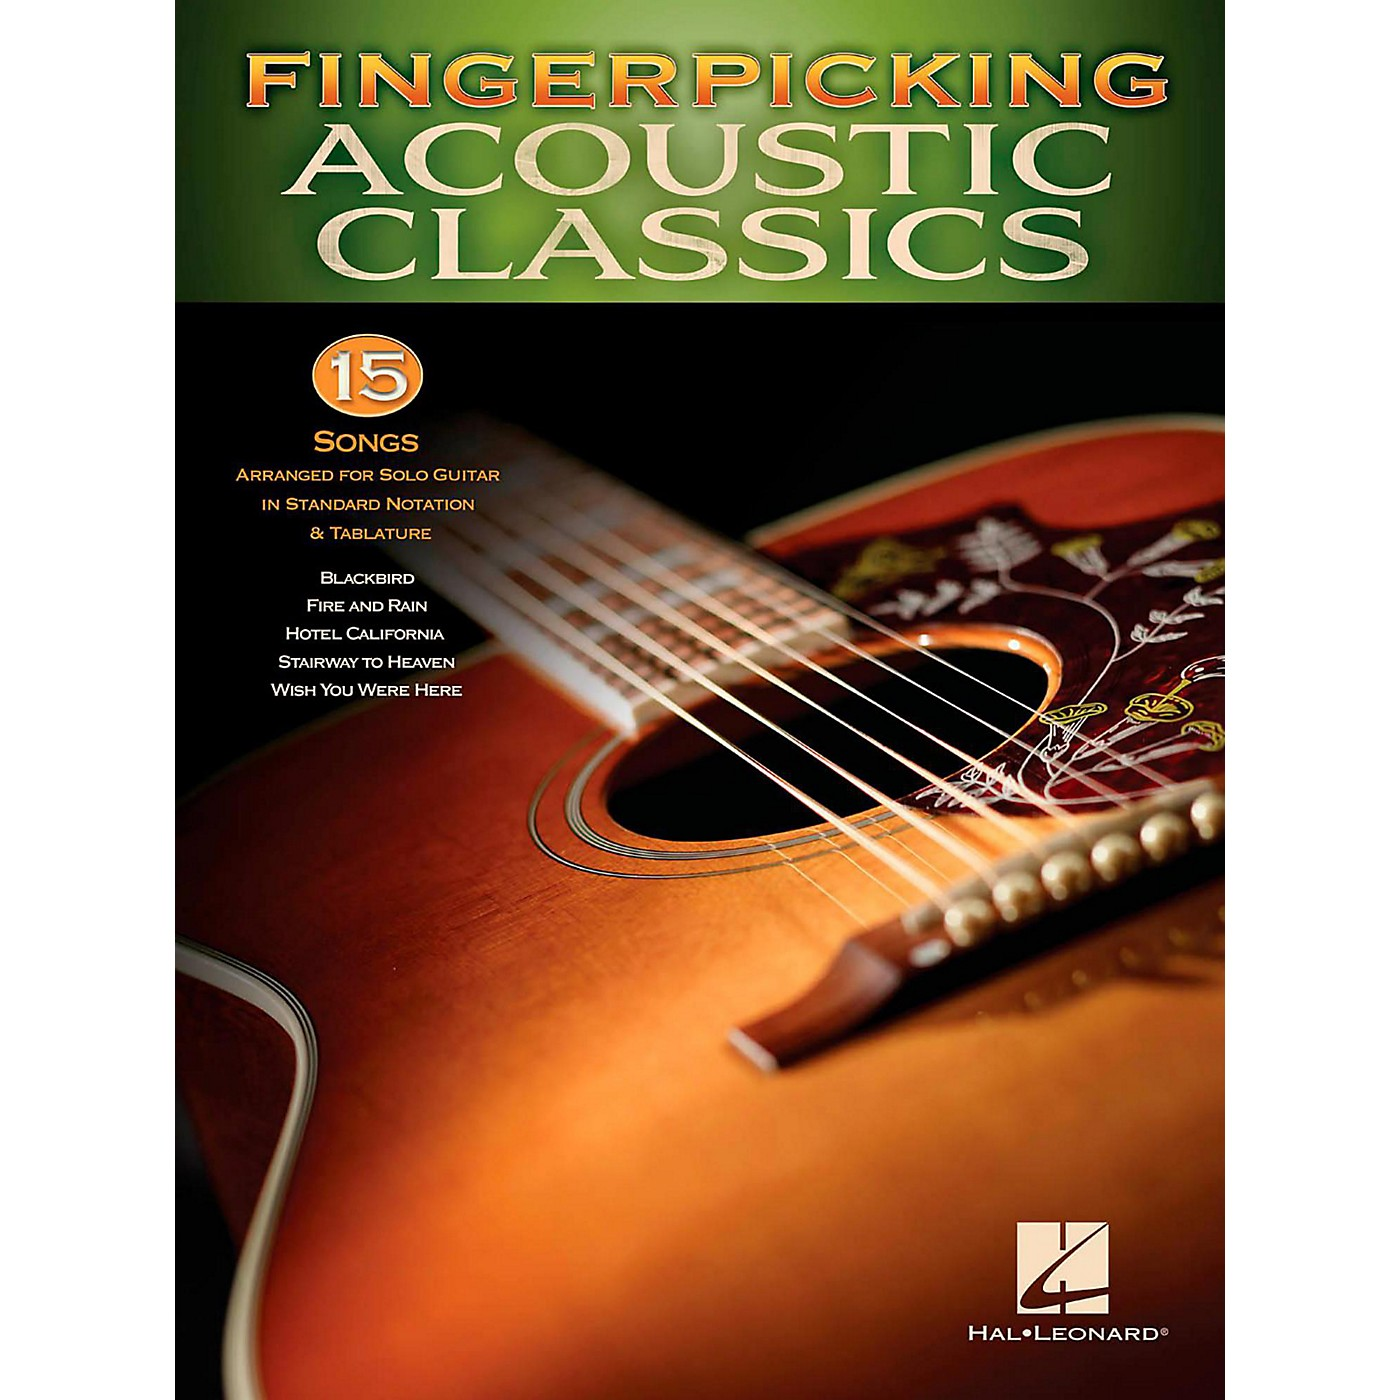 Hal Leonard Fingerpicking Acoustic Classics - 15 Songs Arr. For Solo Gtr In Standard Notation & Tab thumbnail